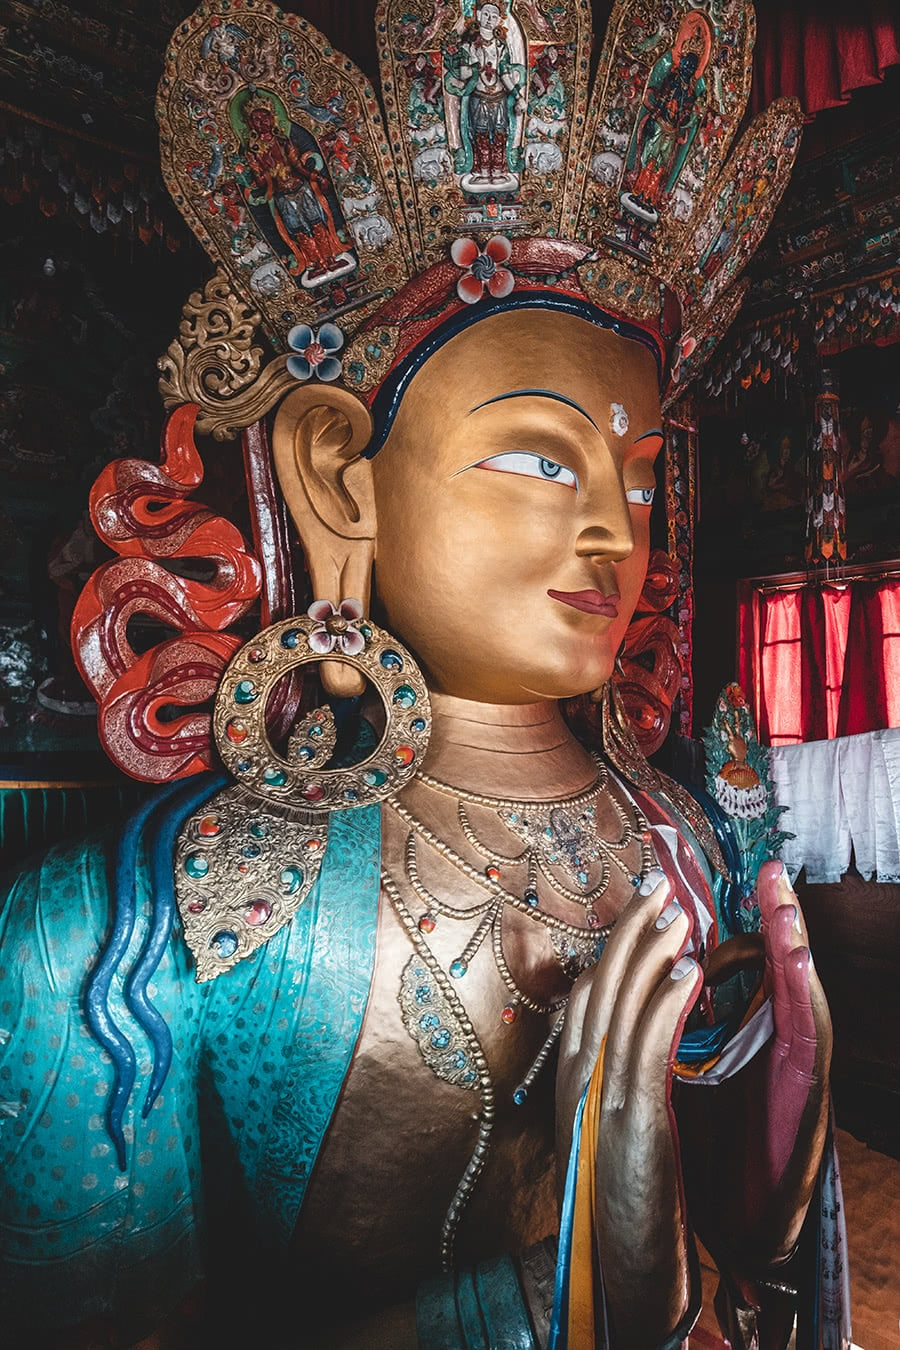 Buddha image at Thiksay Monastery, Ladakh, India.